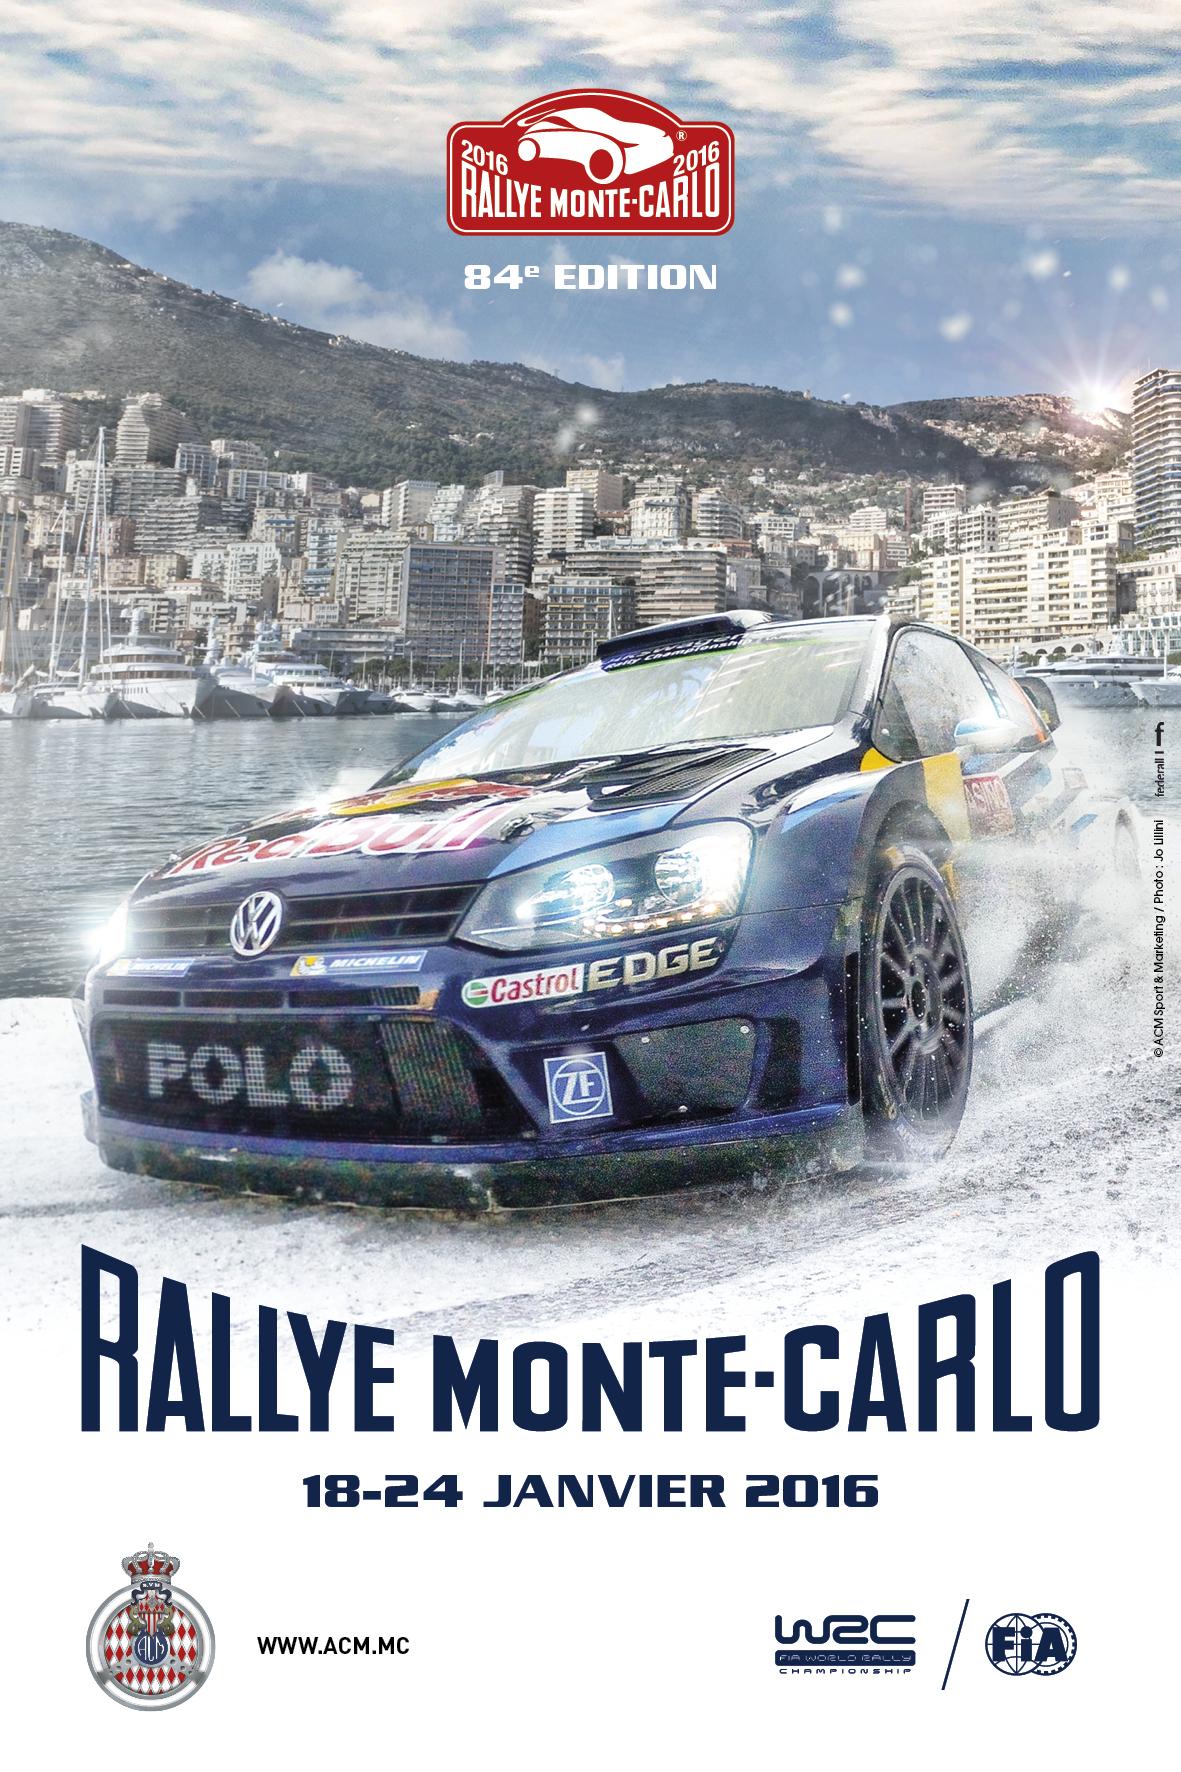 ACM Automobile Club de Monaco, Rally, WRC World Rally Championship, Monte Carlo Rally Poster